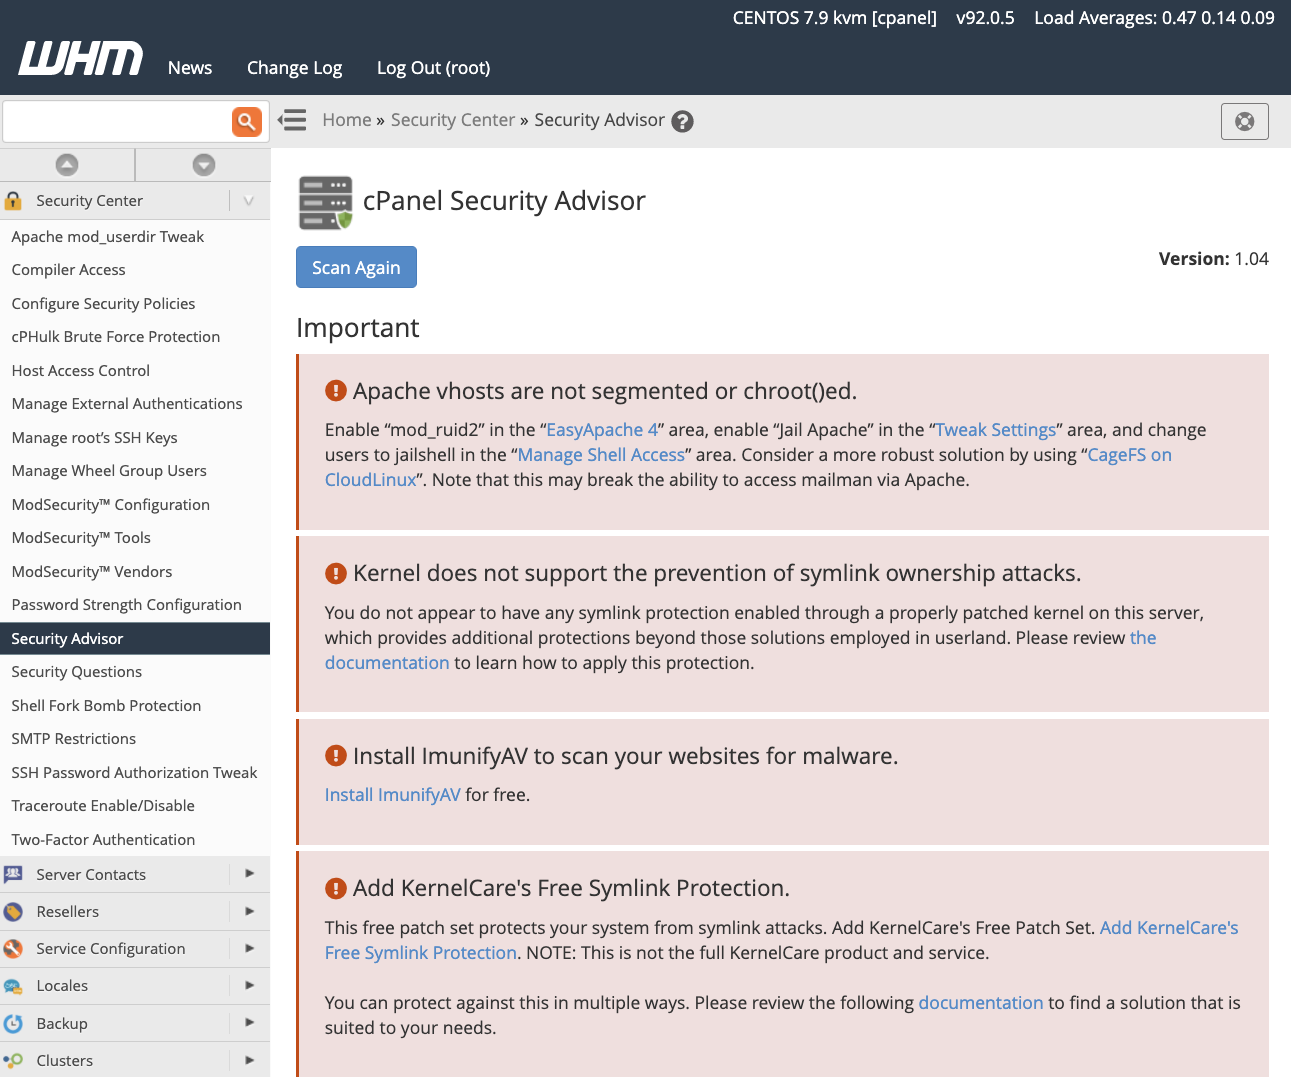 cPanel Security Advisor